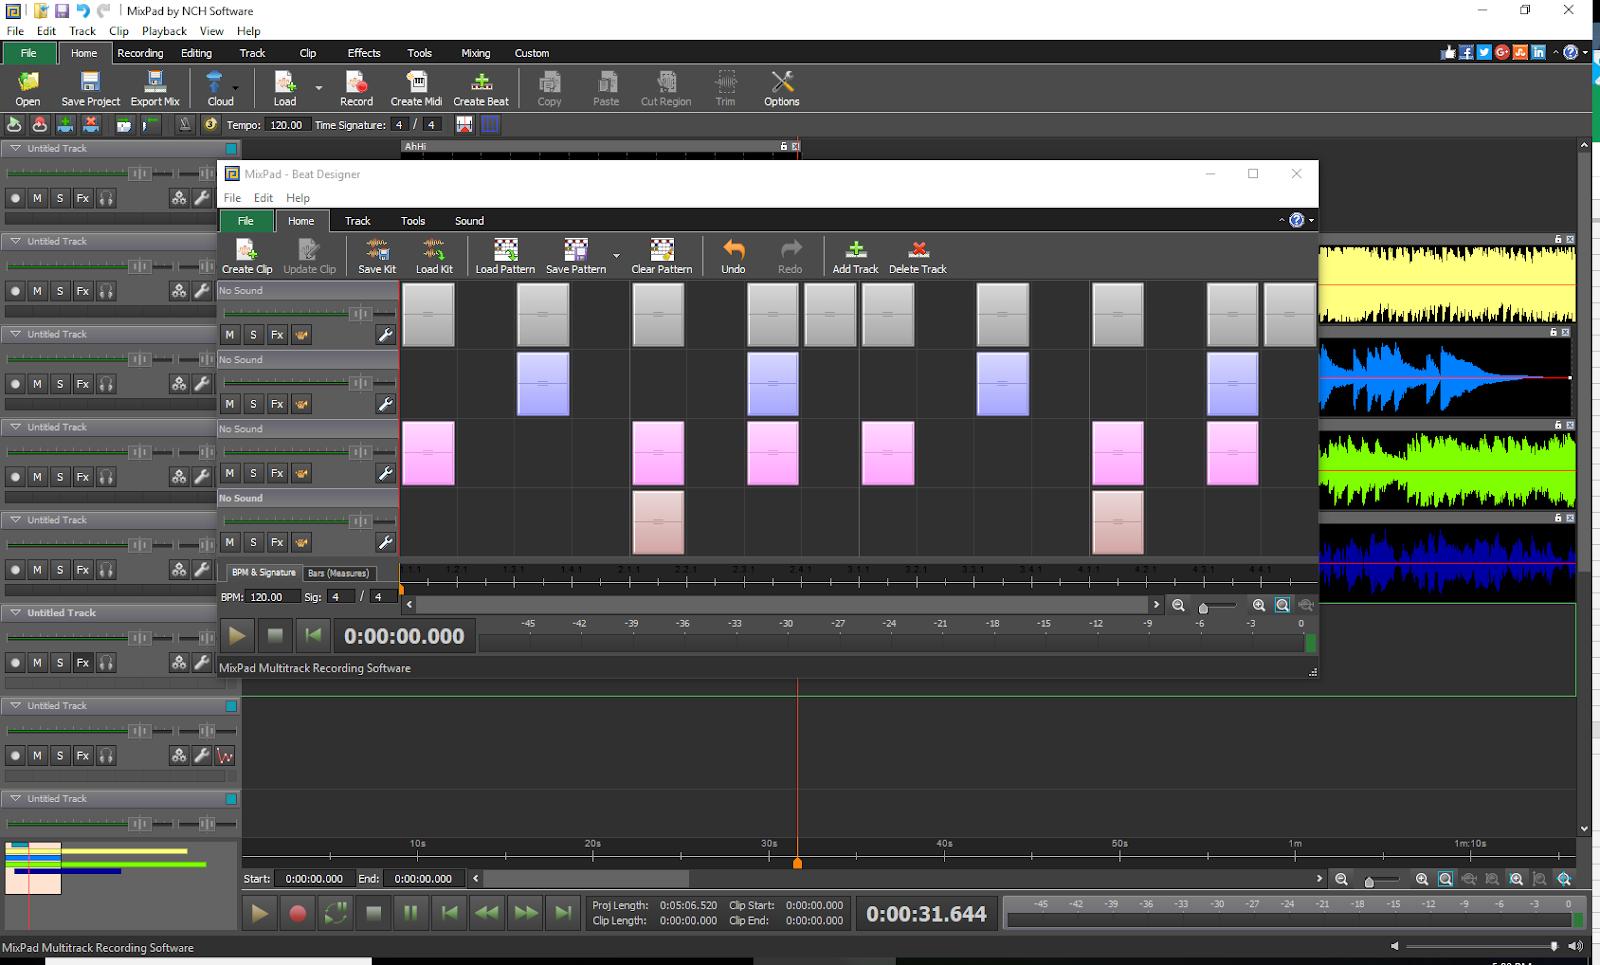 mixpad multitrack recording software crack serial